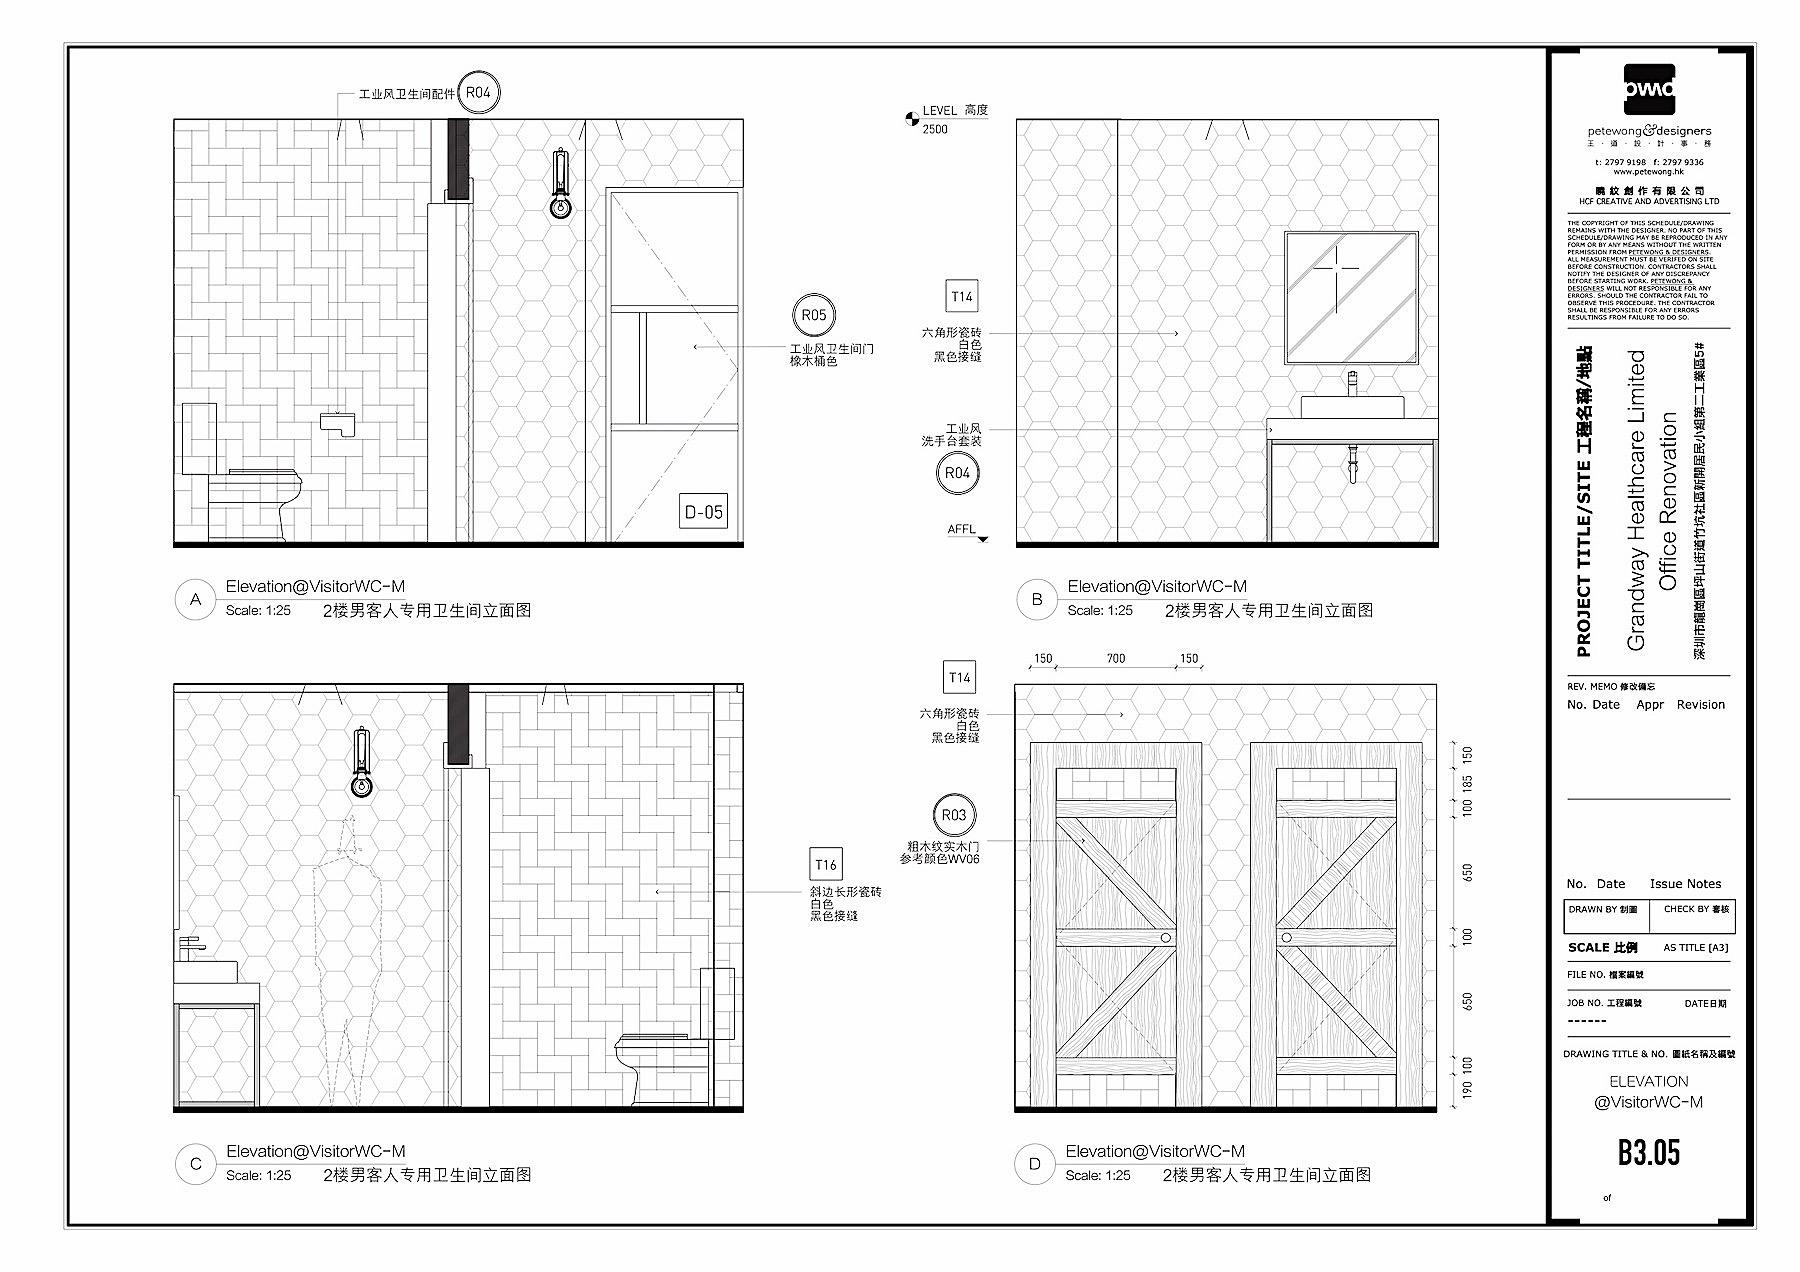 Grandway Office Renovation 2018 Drawing 10